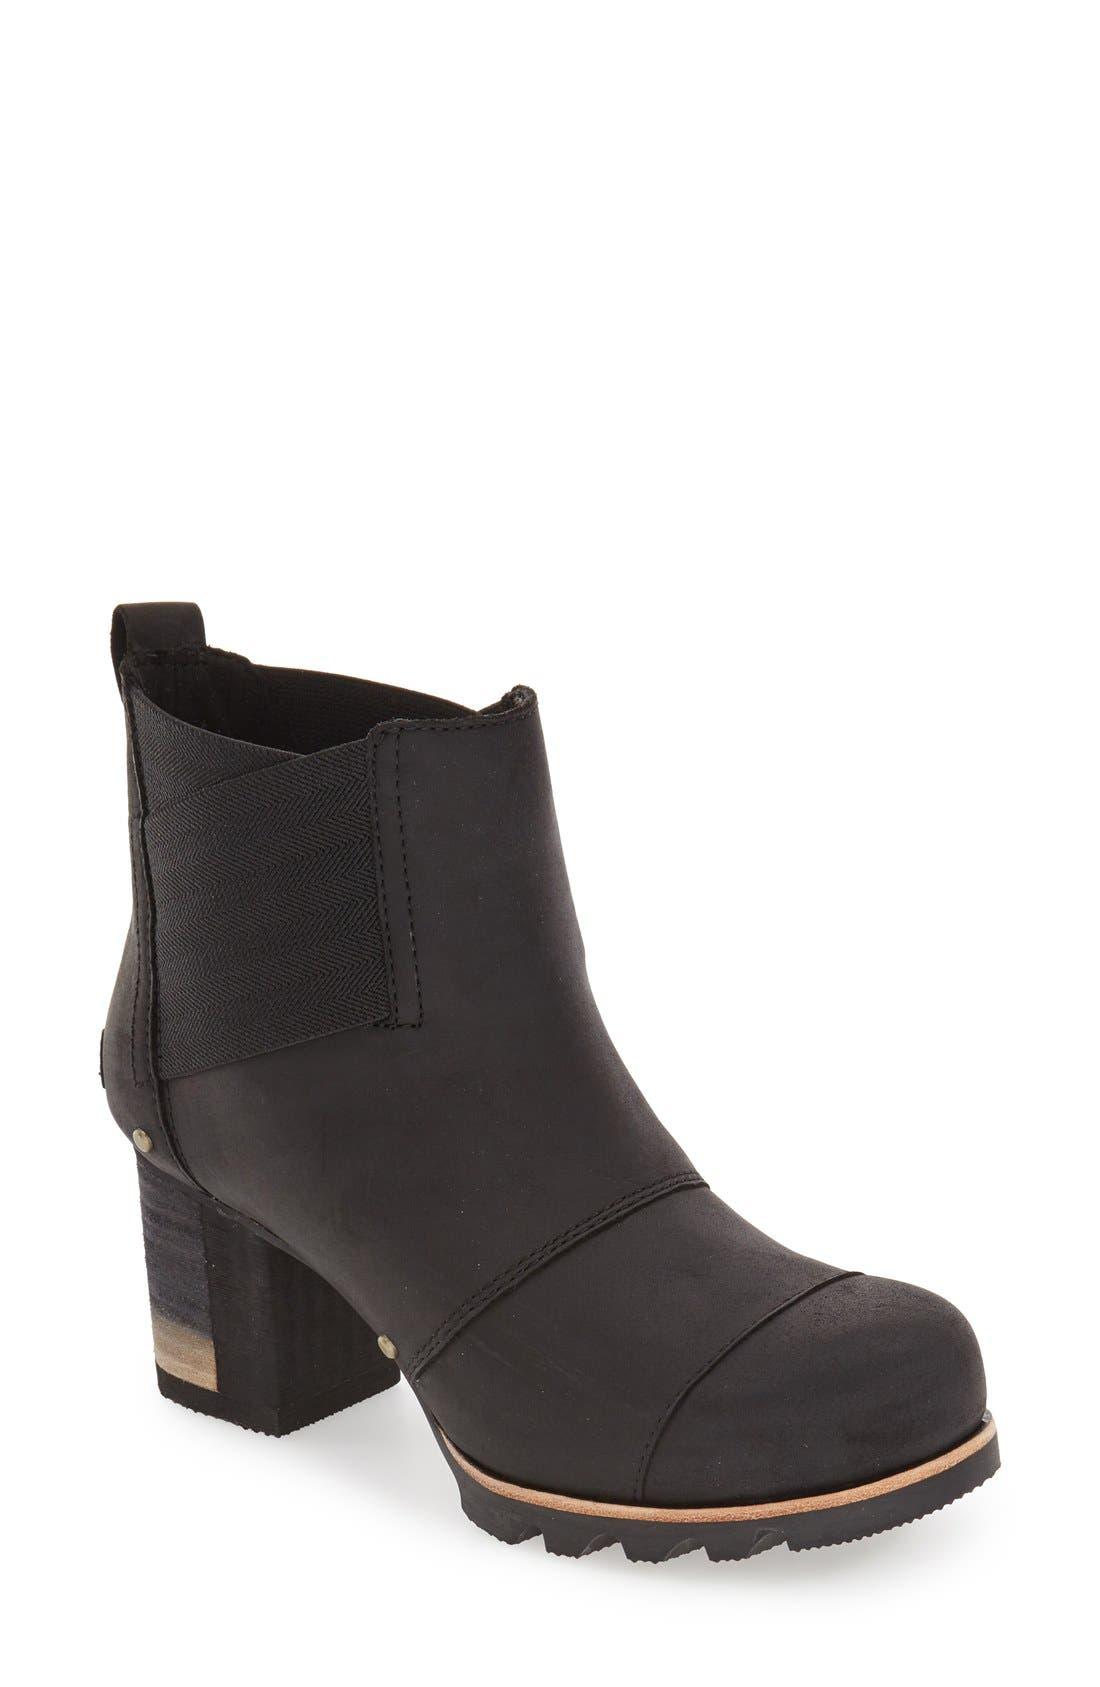 Main Image - SOREL 'Addington' Waterproof Chelsea Boot (Women)